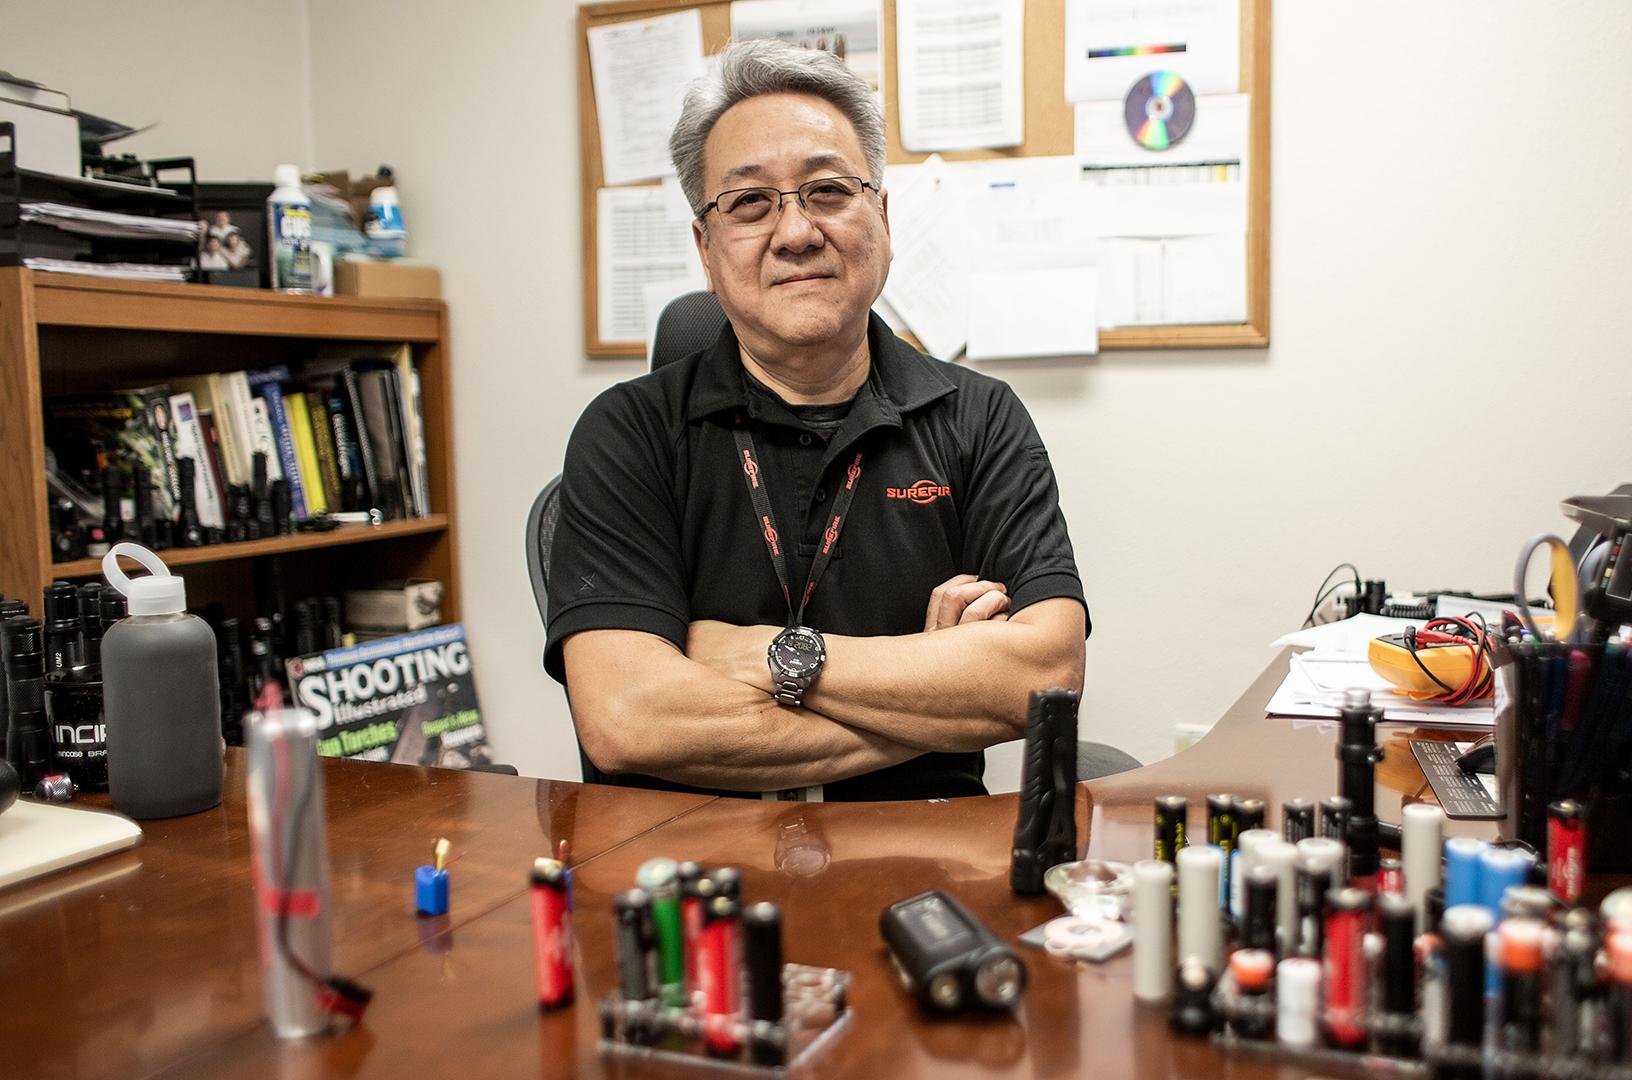 Alex Soo in the SureFire Engineering Department